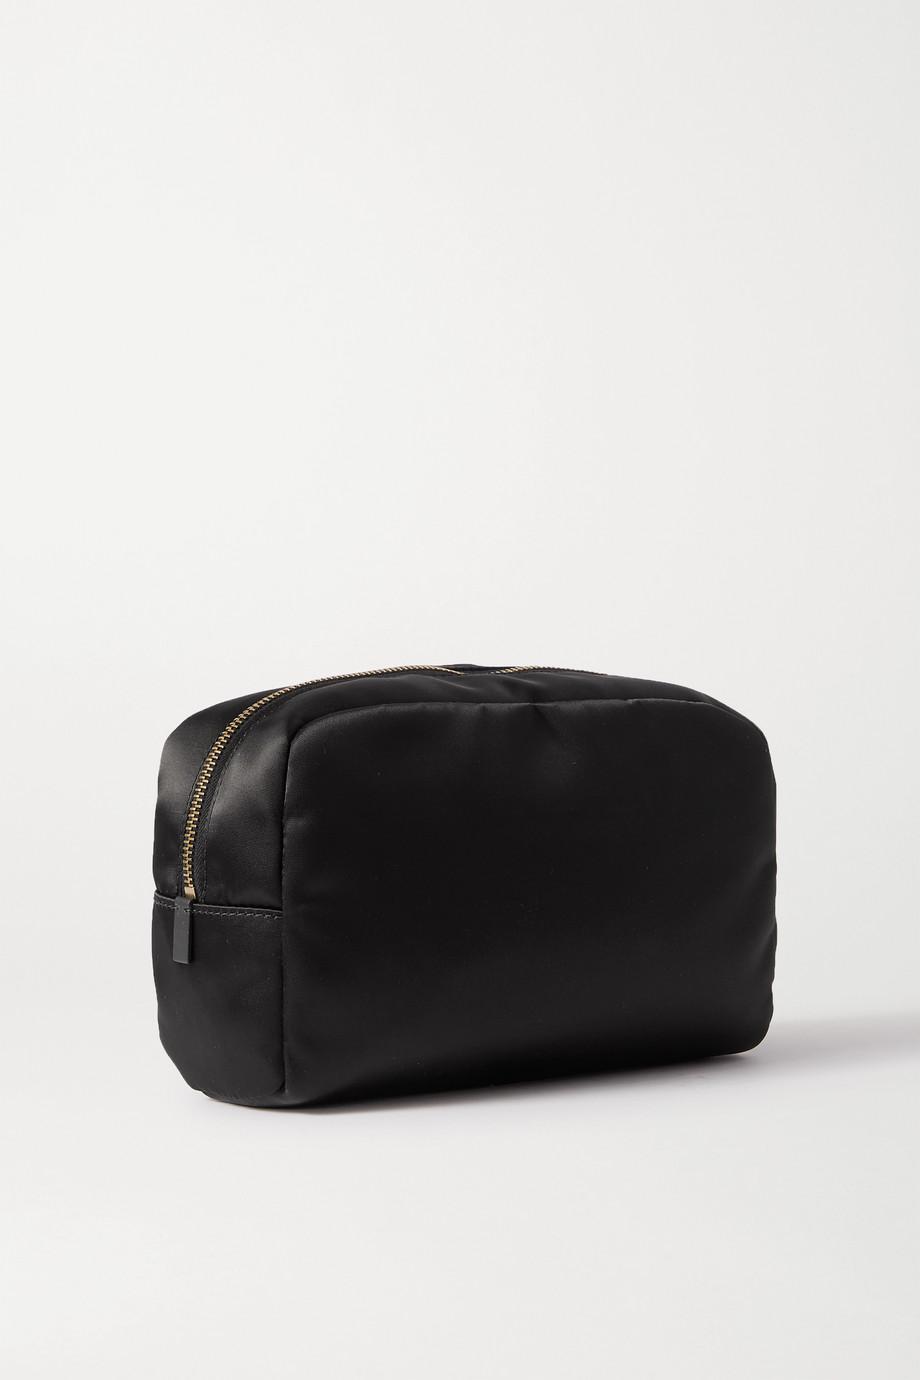 Valentino Valentino Garavani large embellished nylon cosmetics case